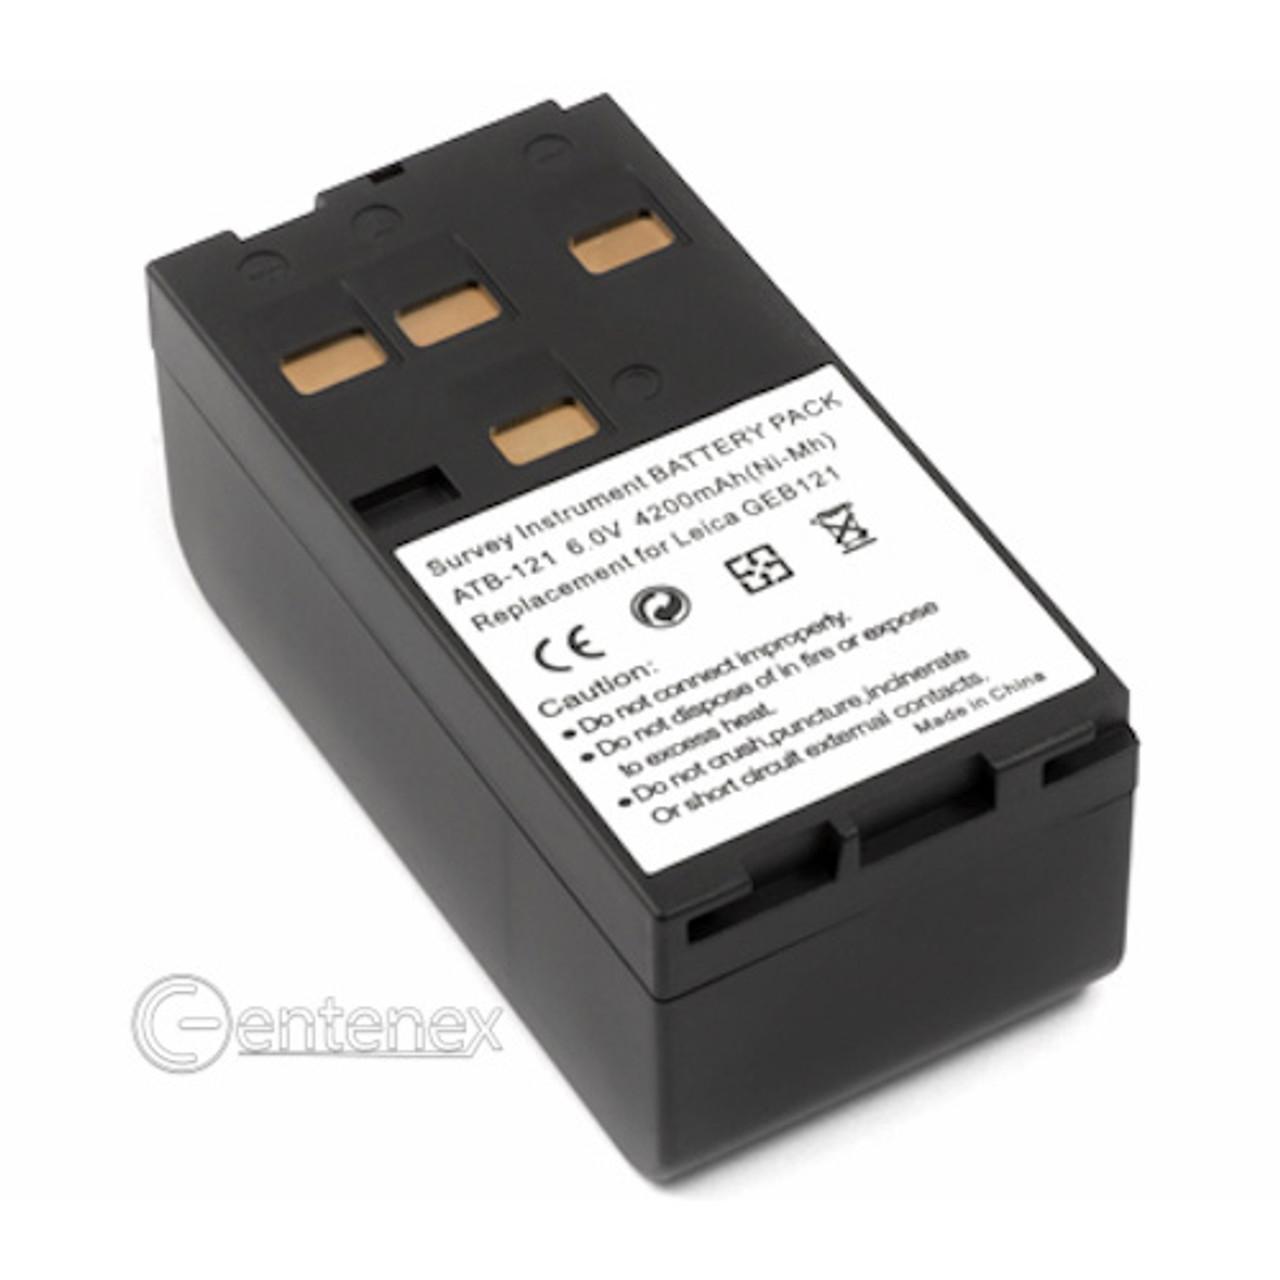 Replacement Battery for Leica 400 700 800 DNA Instruments DNA03//10 GPS500 GS50 GS50 GPS RCS1100 SR500 Part NO HITARGET BT10 BT20 Leica GEB121 GEB122